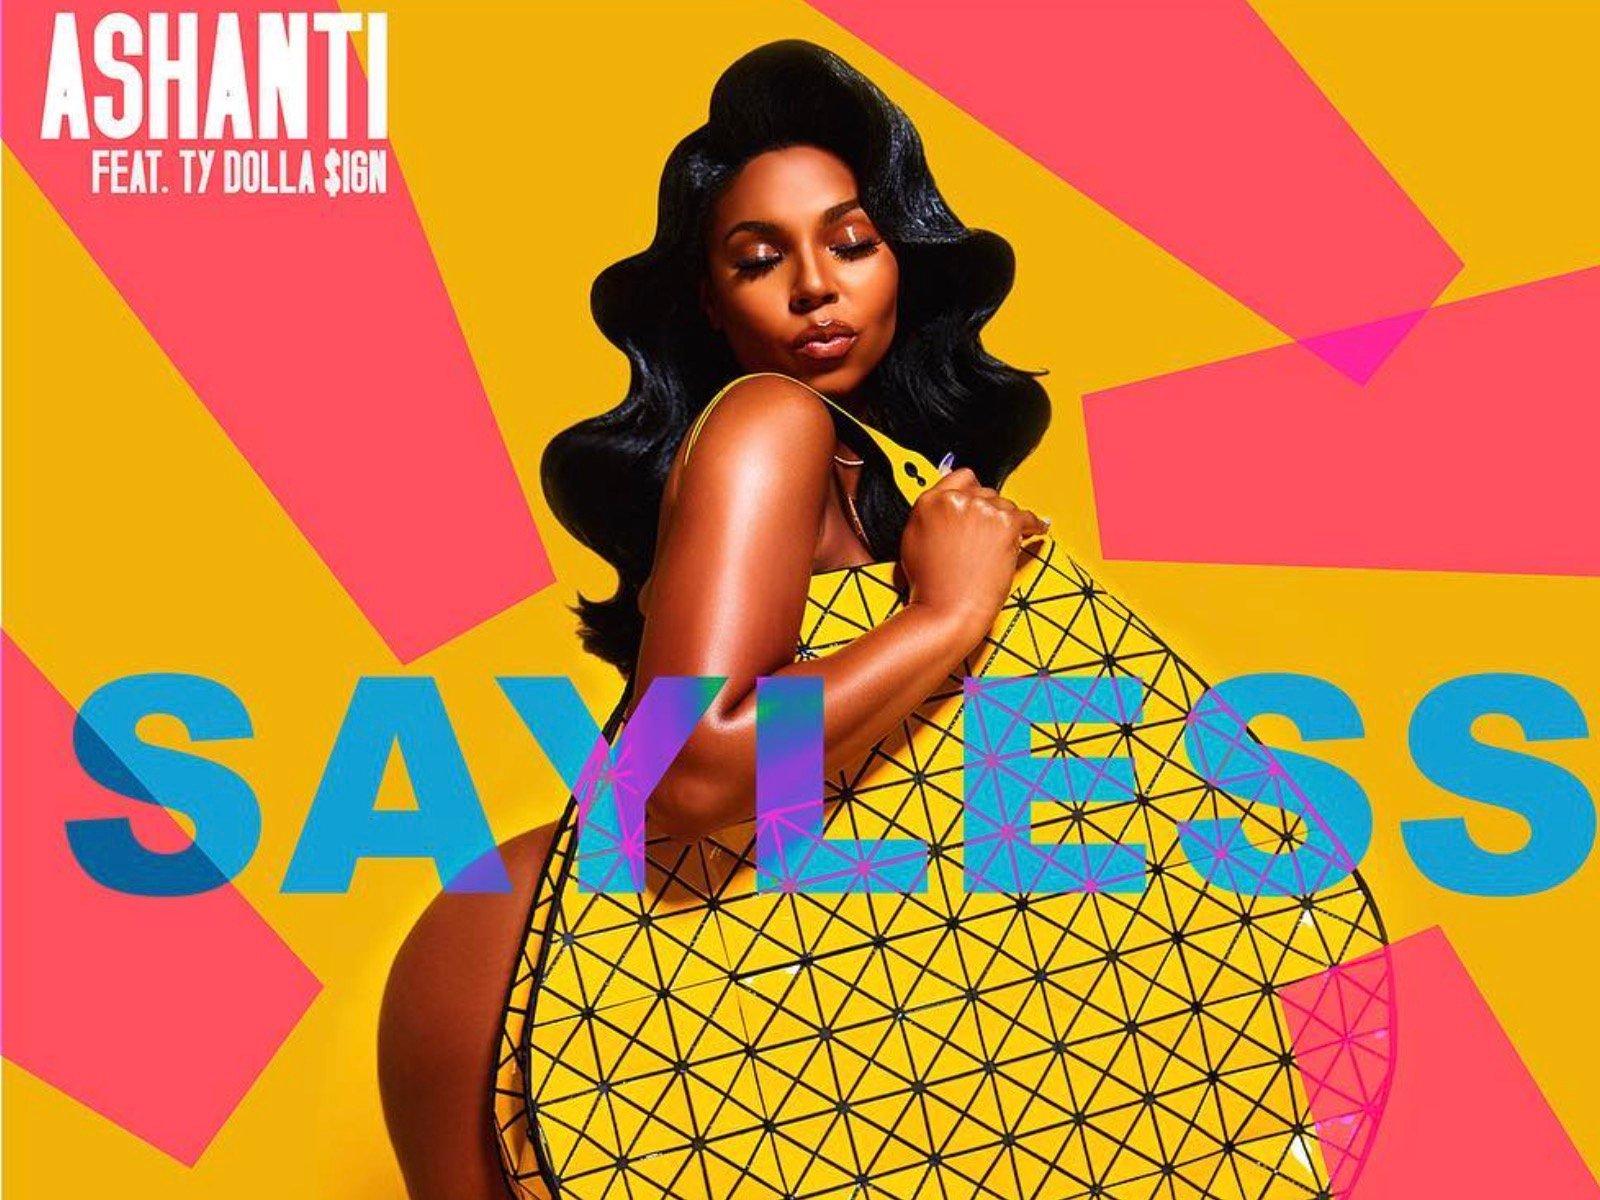 Ashanti Sayless